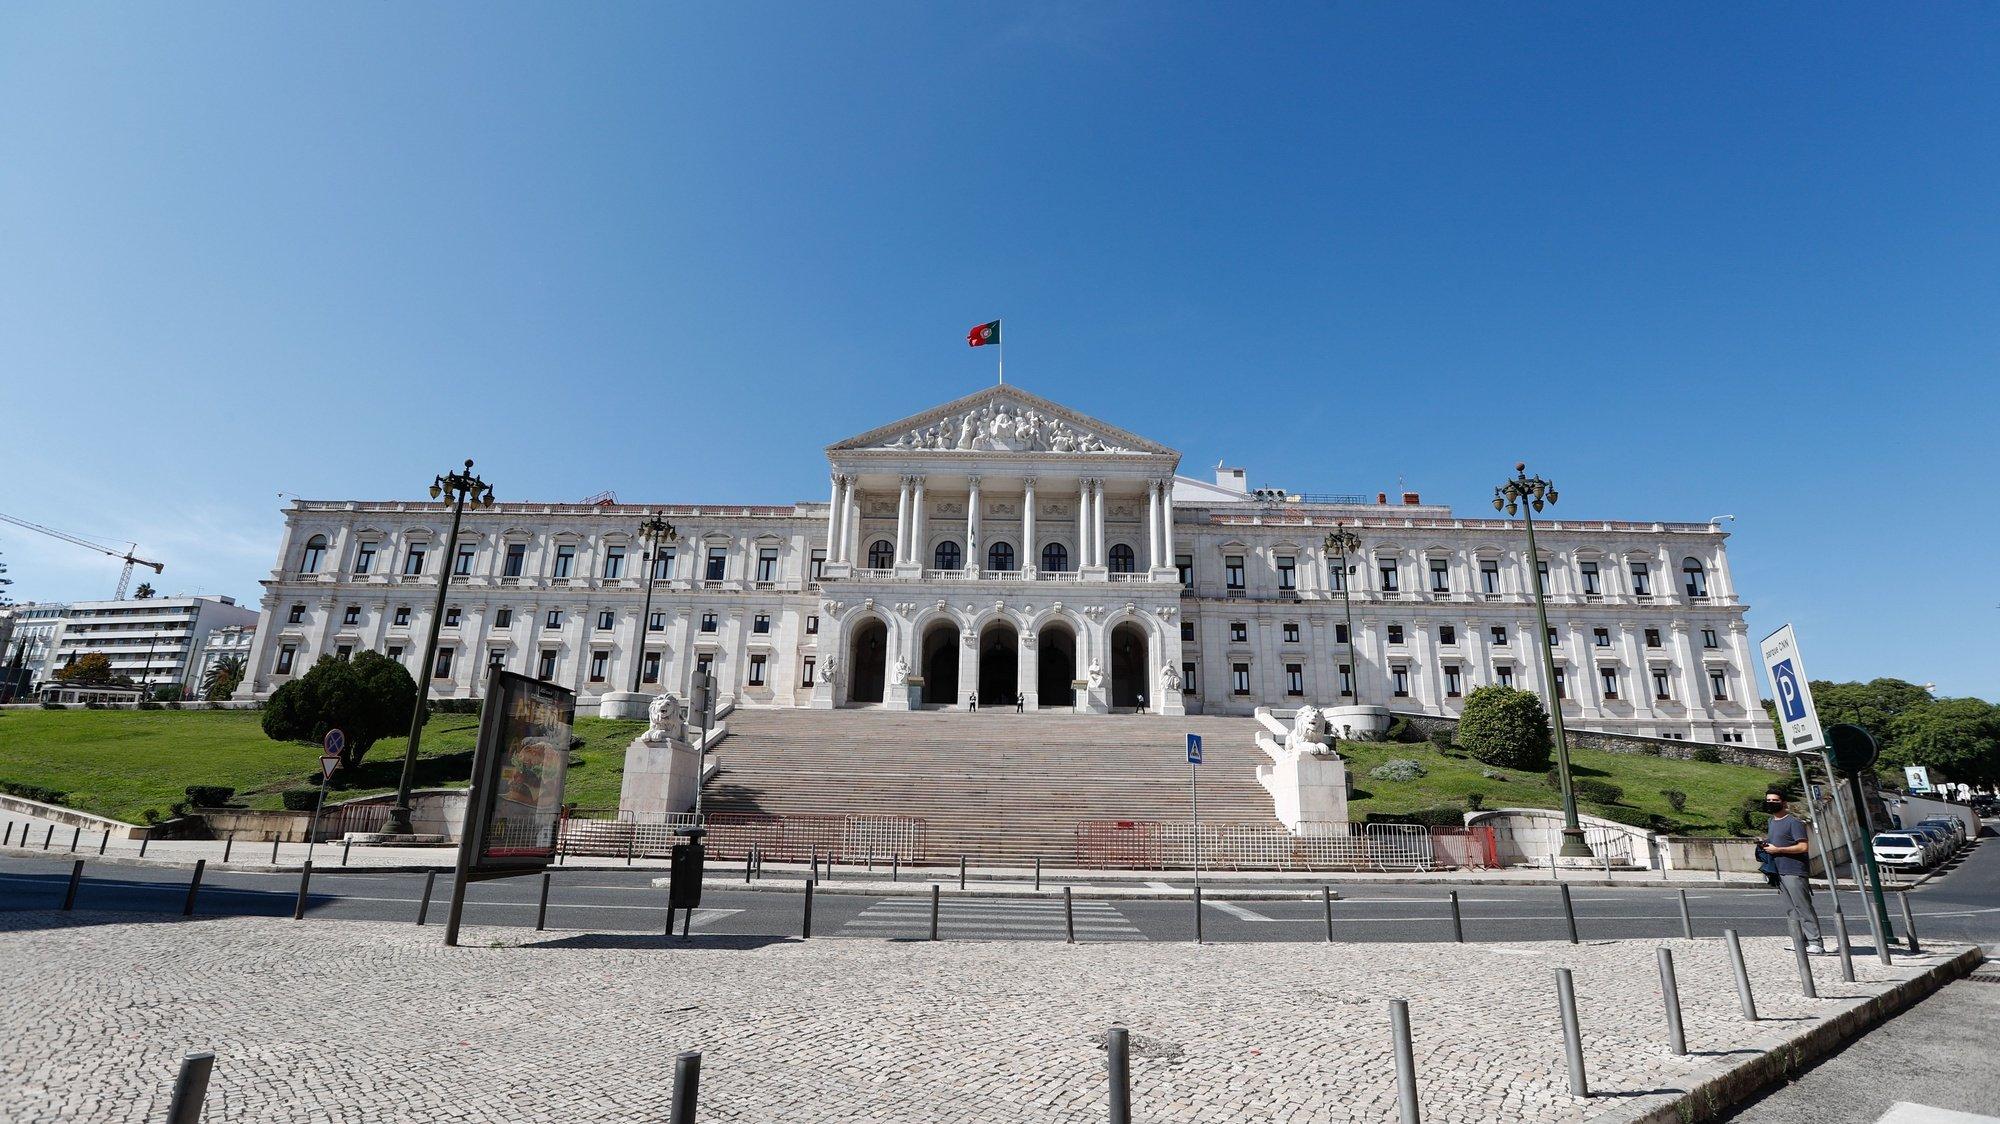 Fachada da Assembleia da República, Lisboa, 07 de outubro de 2020. ANTÓNIO COTRIM/LUSA